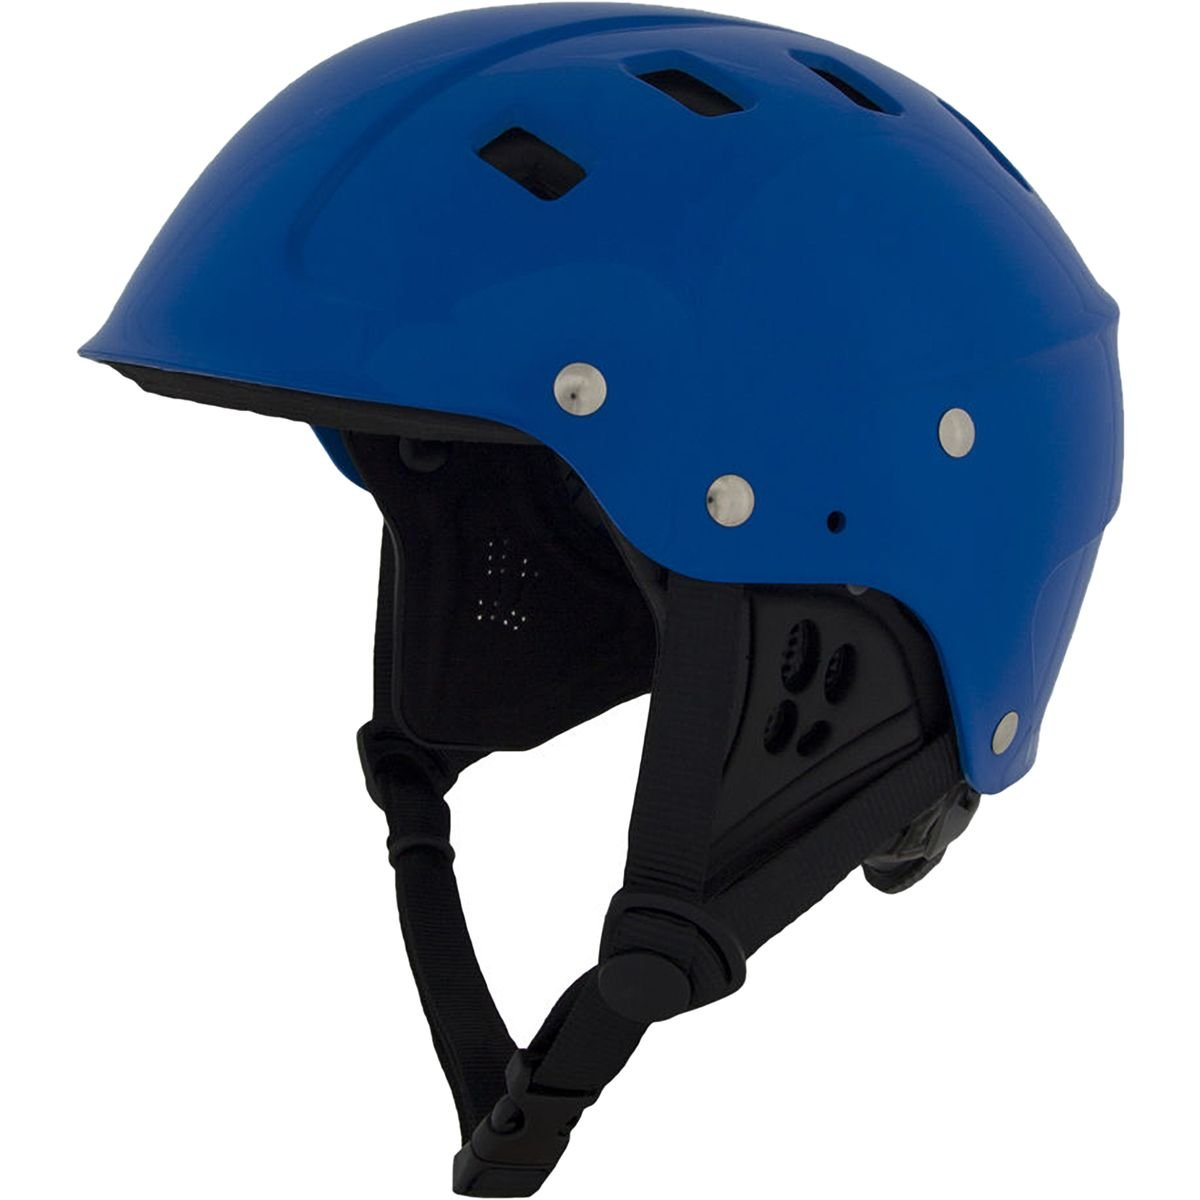 NRS Chaos Side Cut Helmet Blue Small by NRS